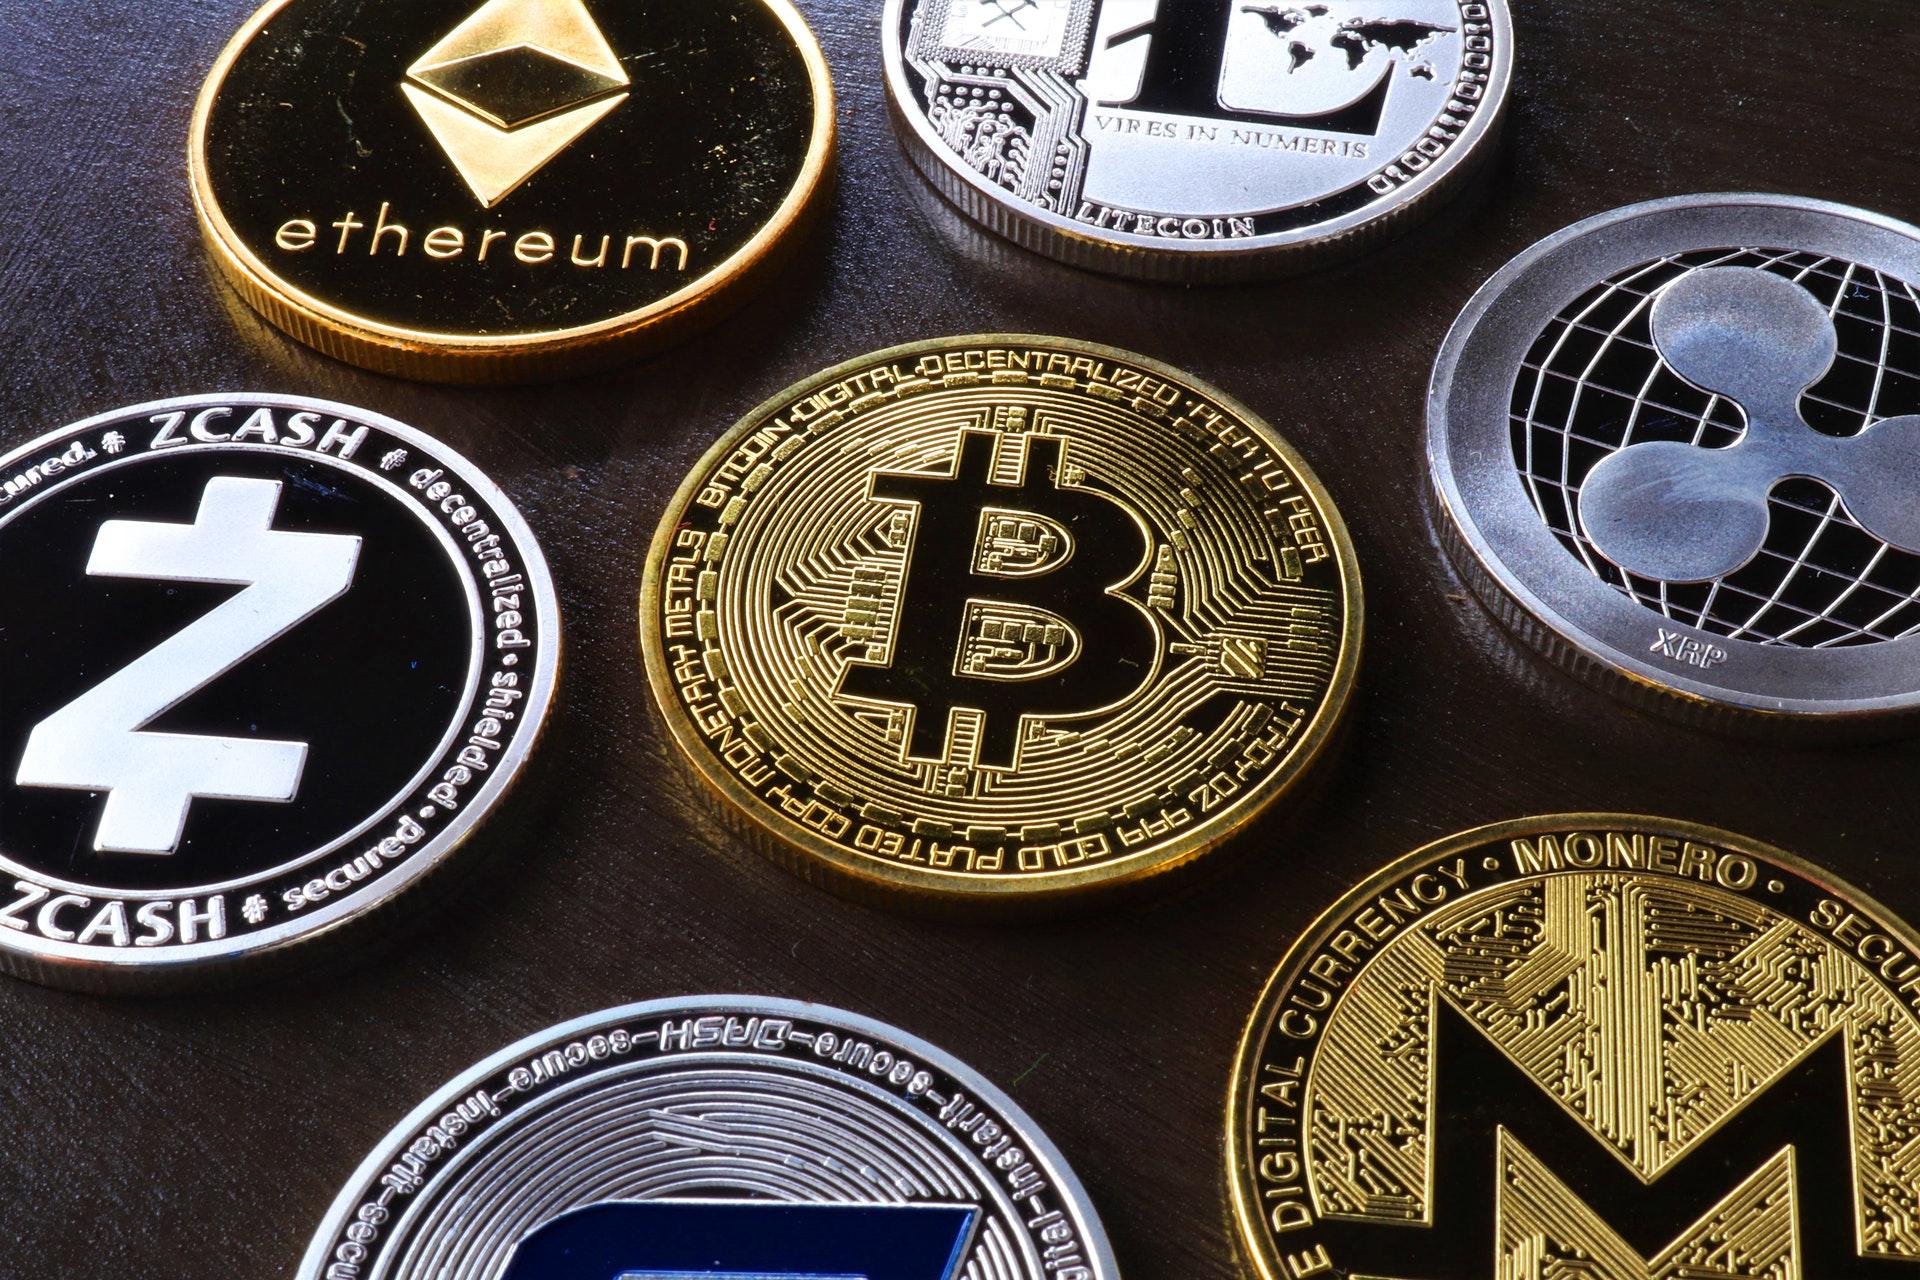 Blockchain technology is the future of digital finance